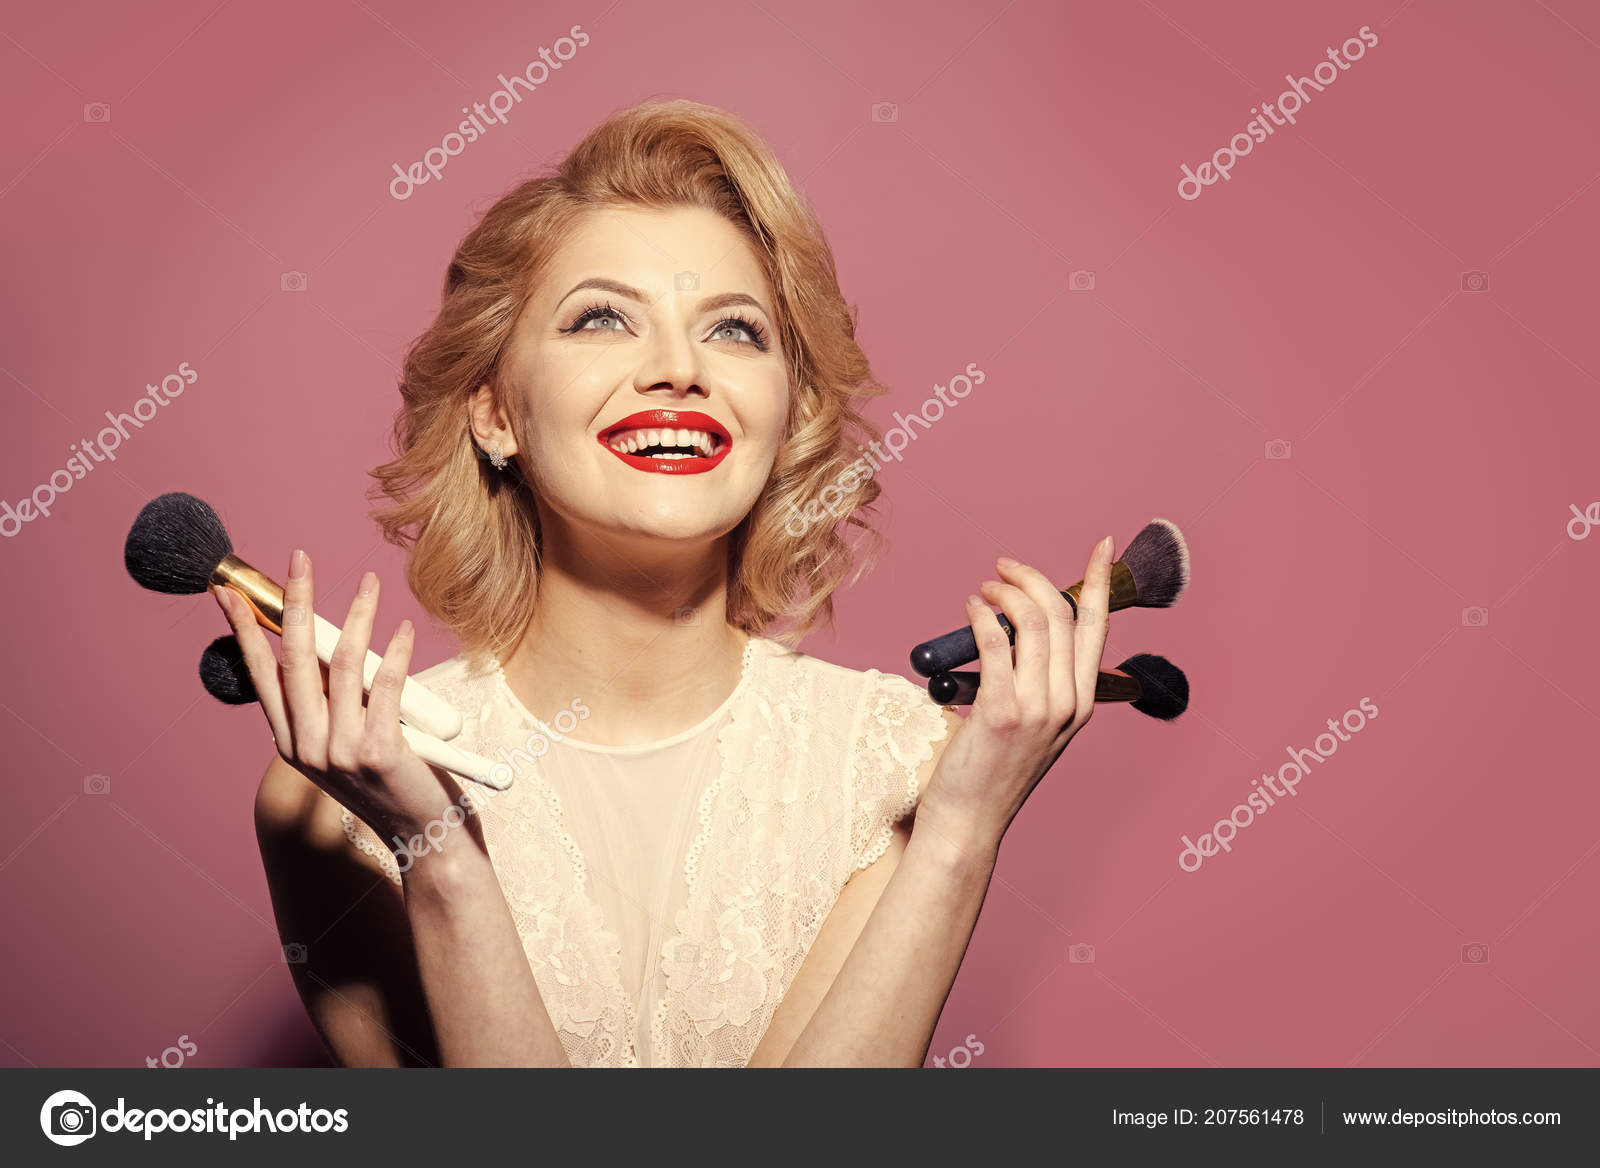 982c46d6b9d4 Schönheit, Mode, Kosmetik, Vintage-Stil. Retro-Frau mit Make-up ...